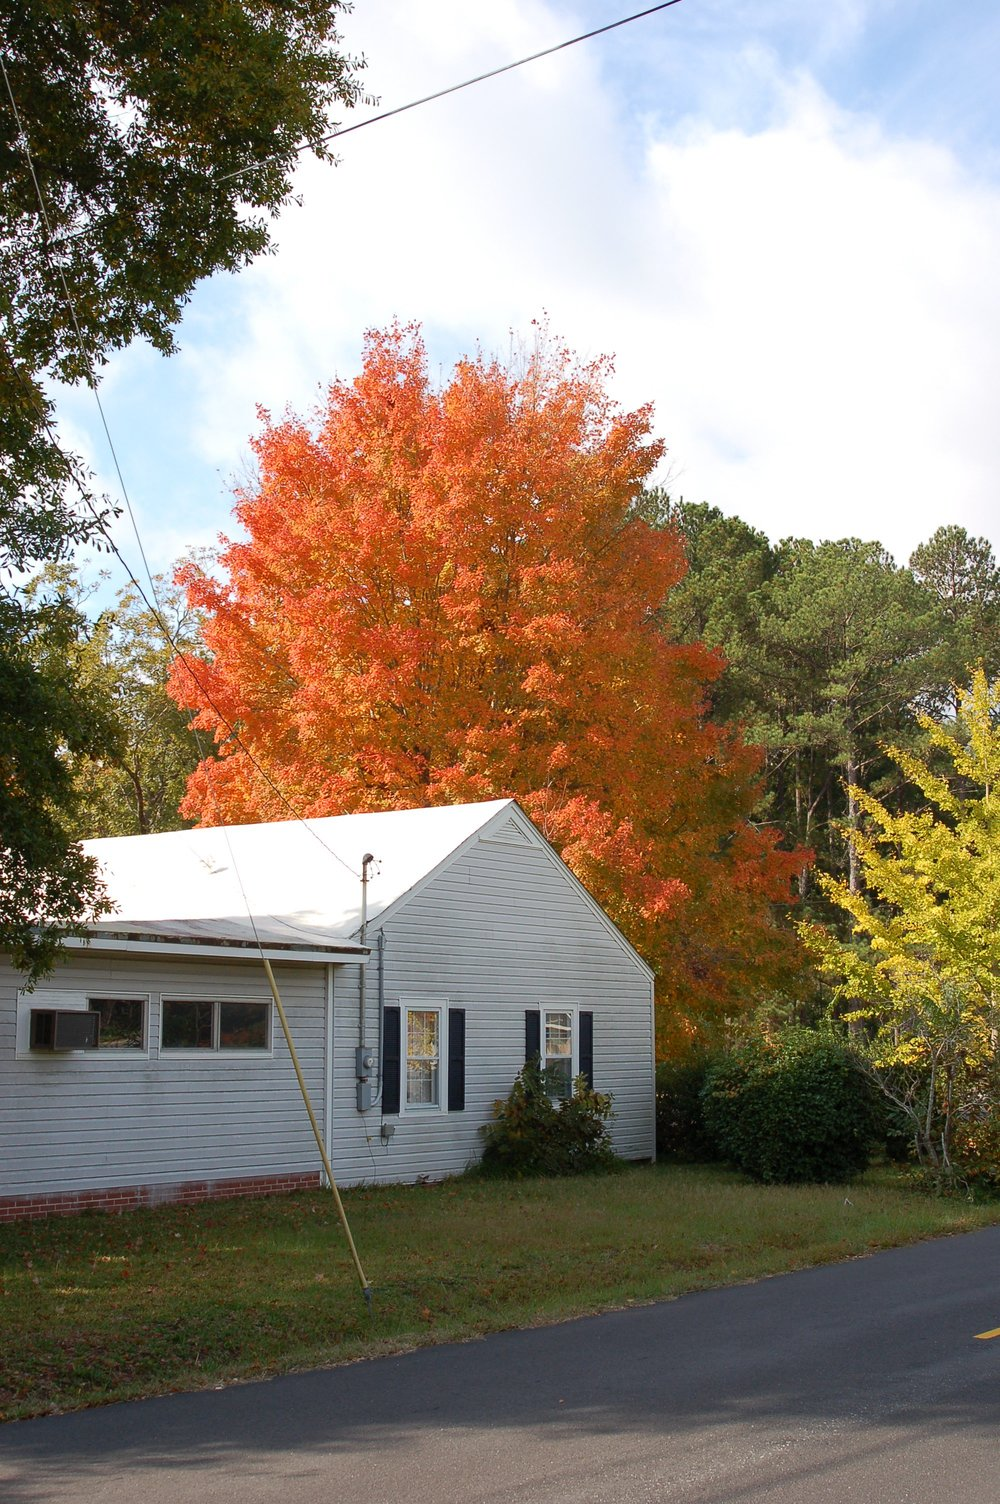 Harvest-Moon-Sugar-Maple-Acer-saccharum-fall-color-habit.jpg